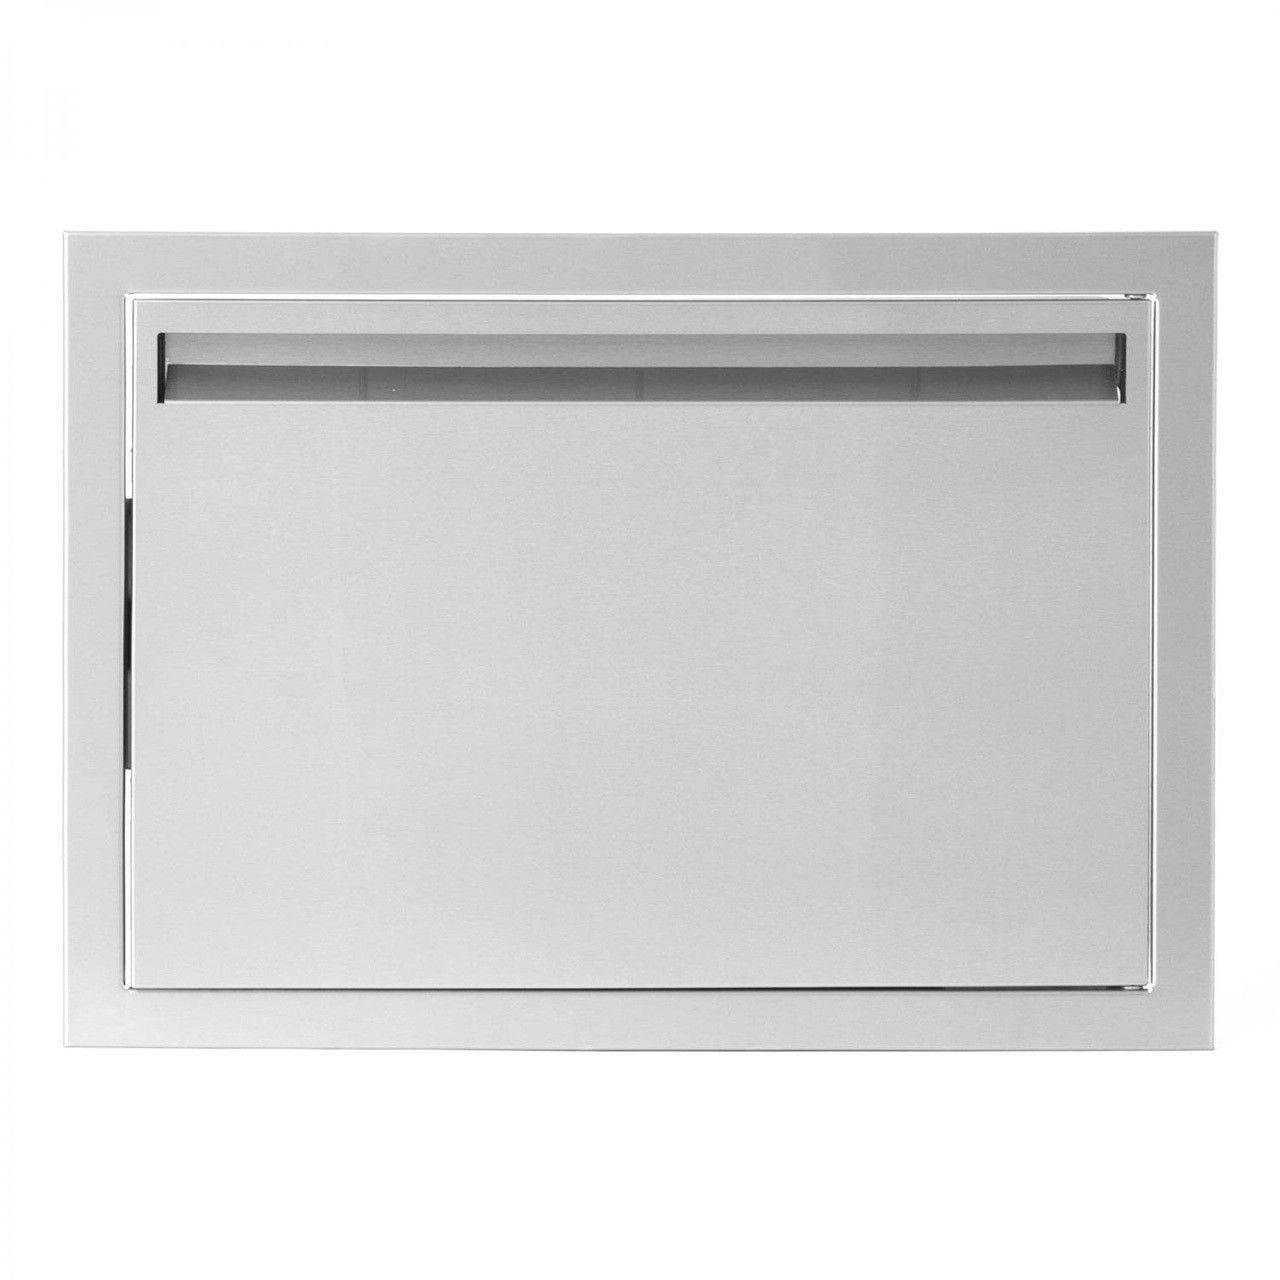 Uol x single access door h pin hinge doors and